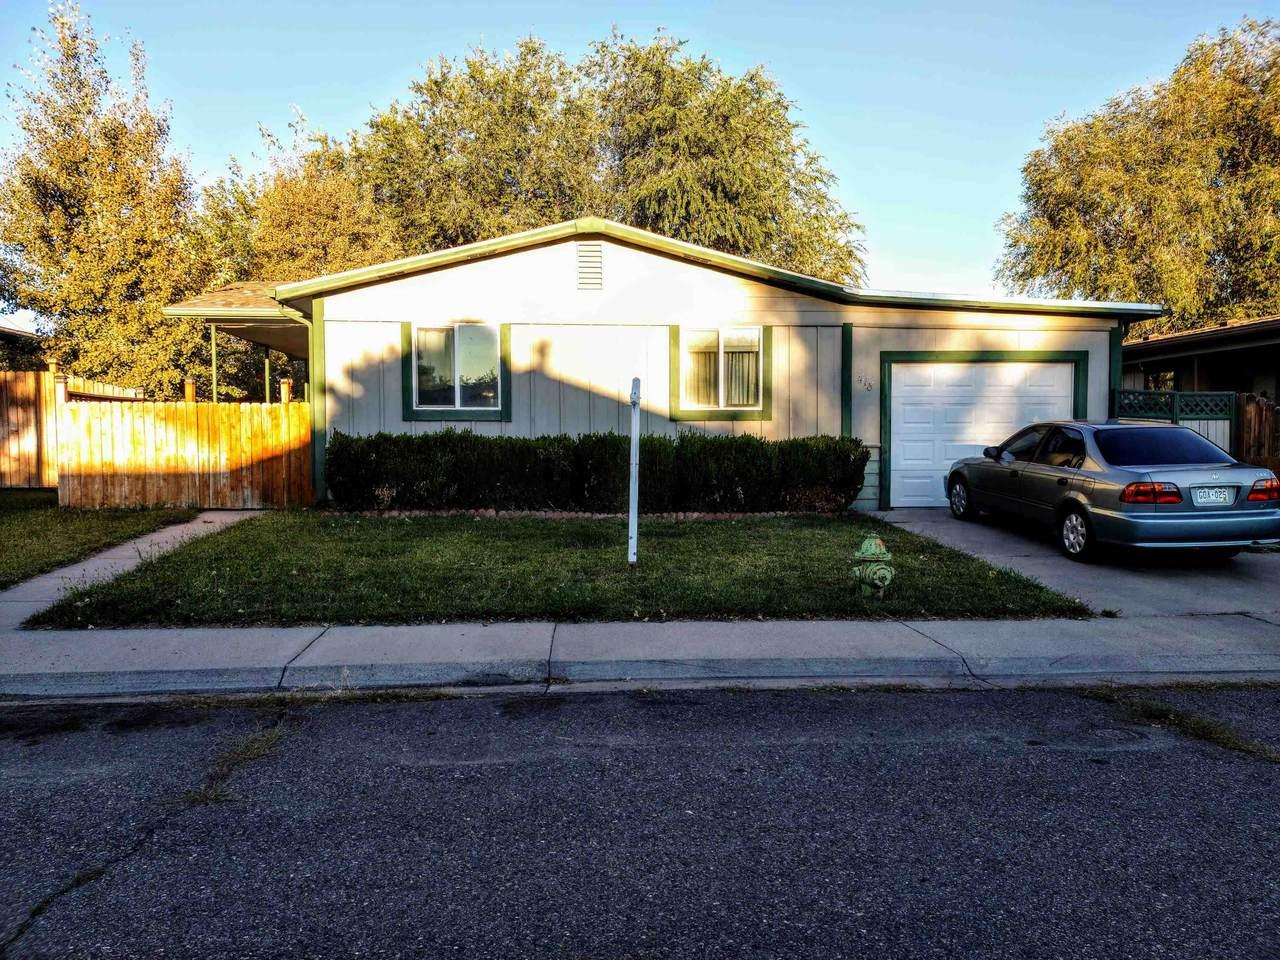 418 Glendale Way - Photo 1